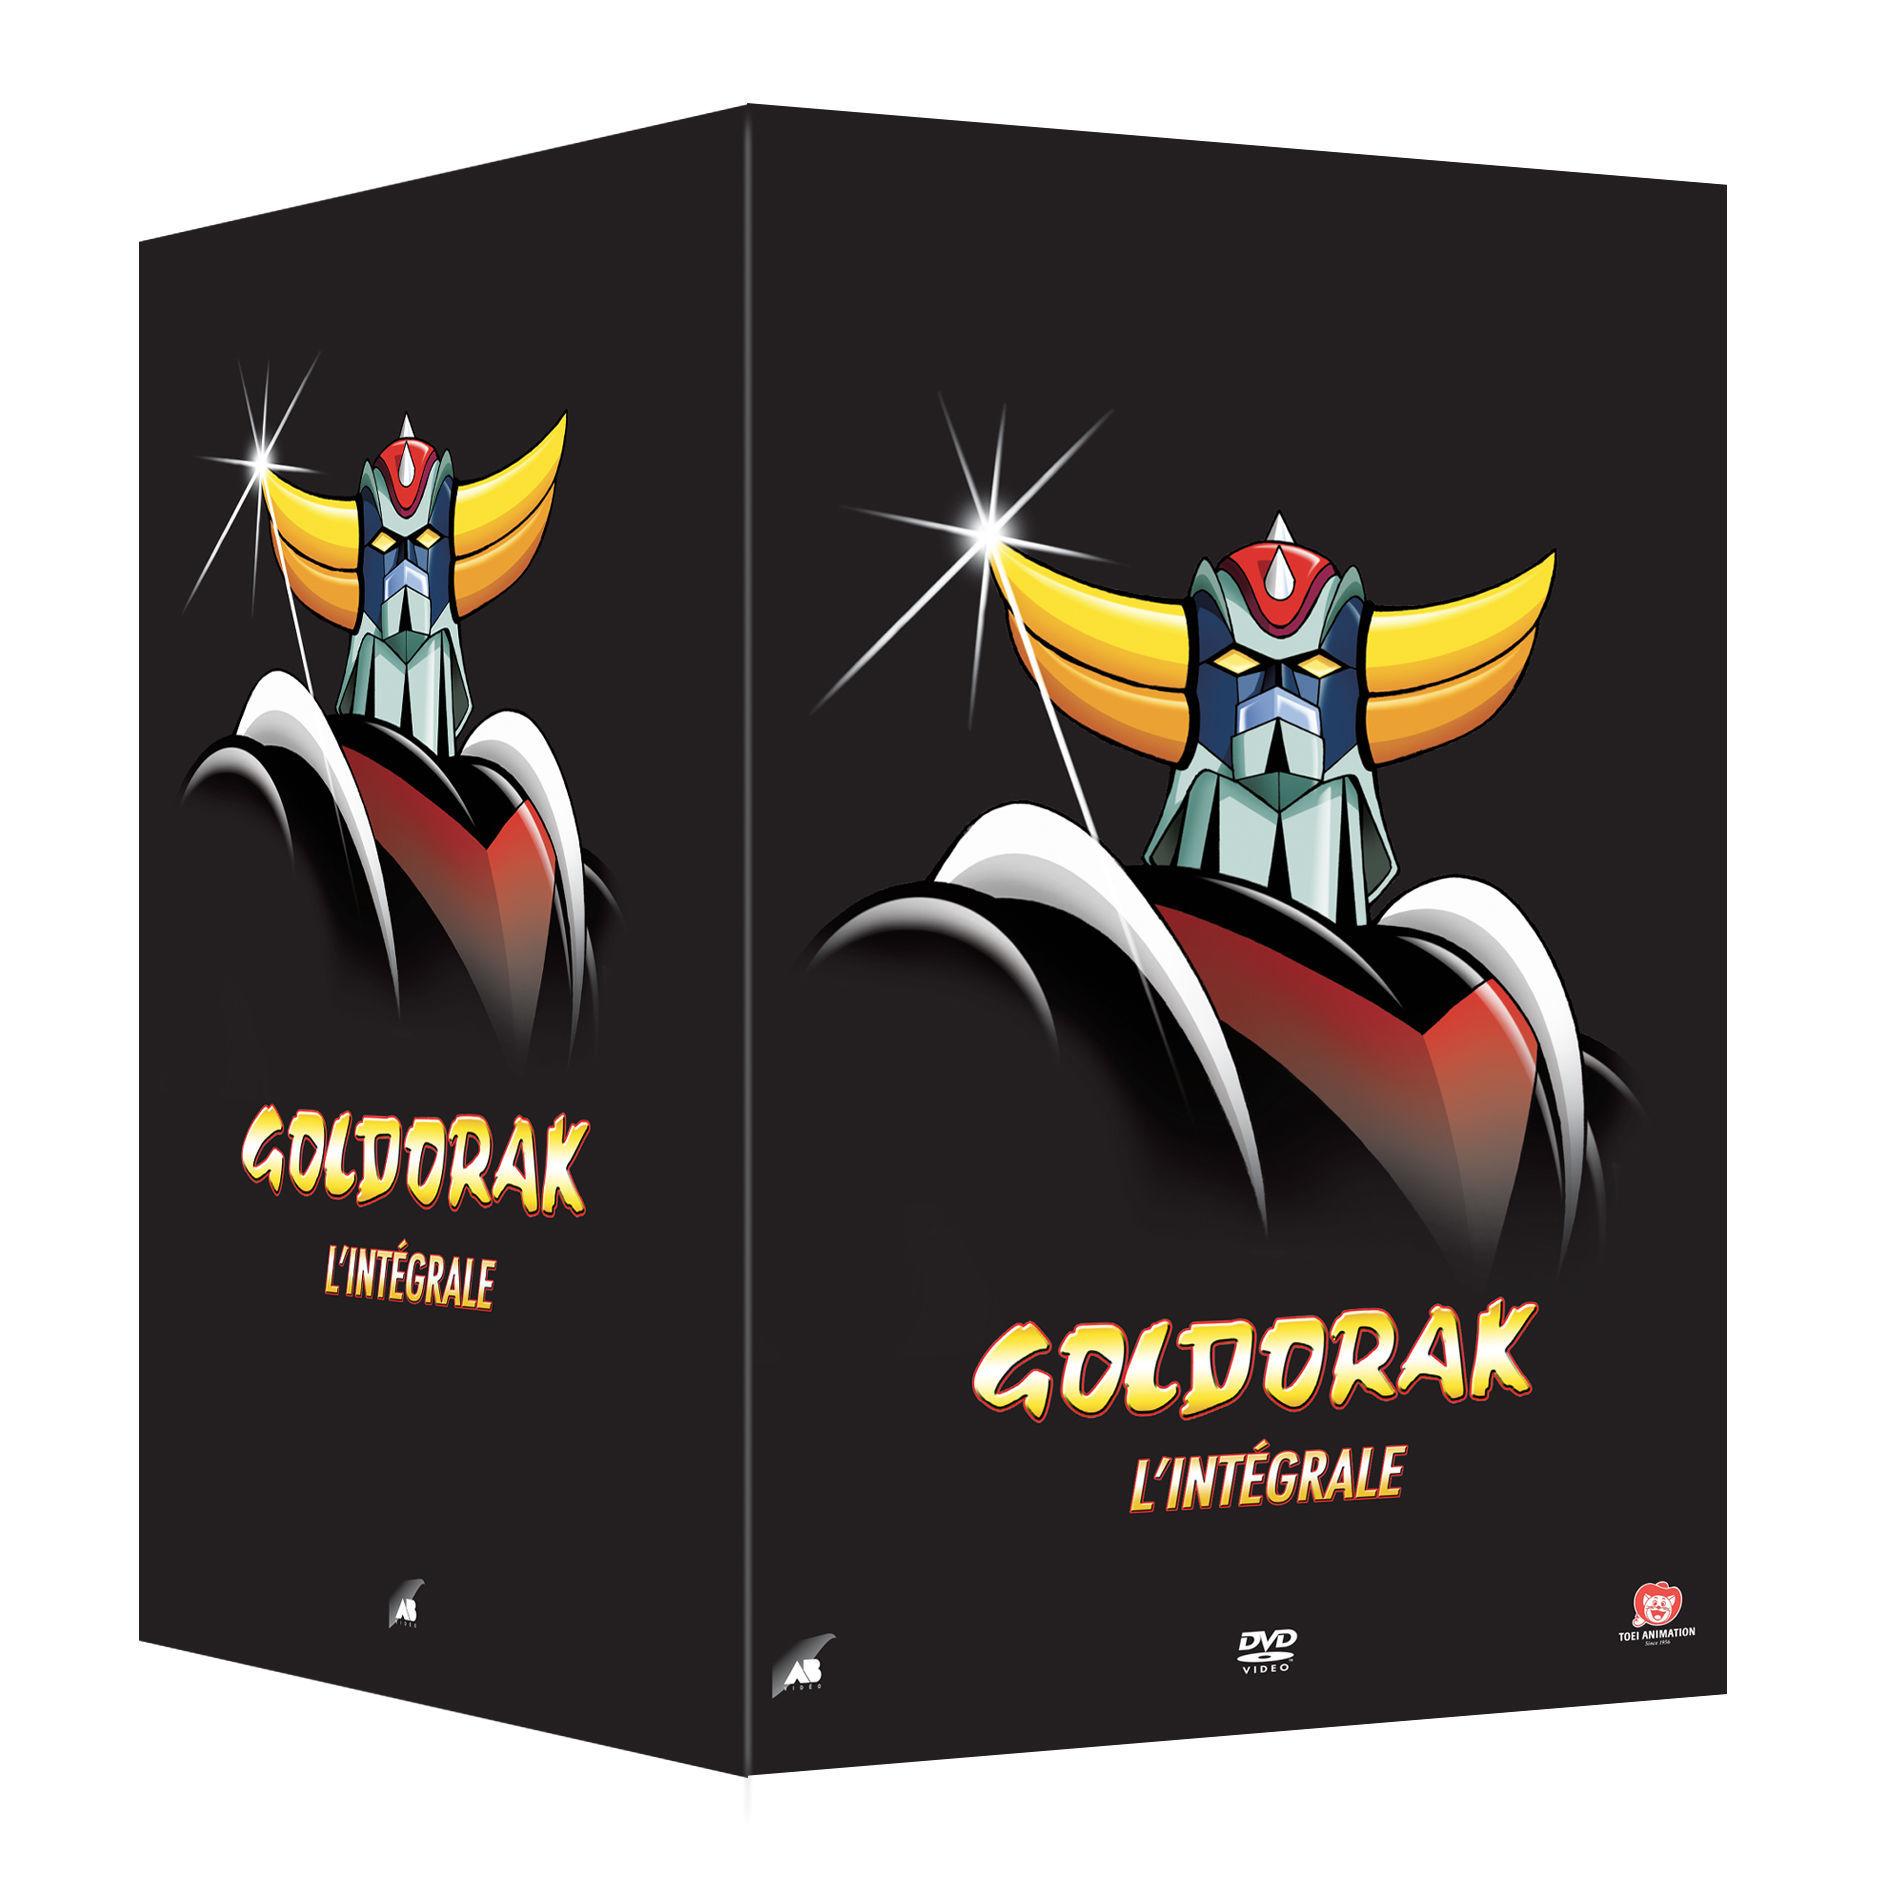 Goldorak l'intégrale